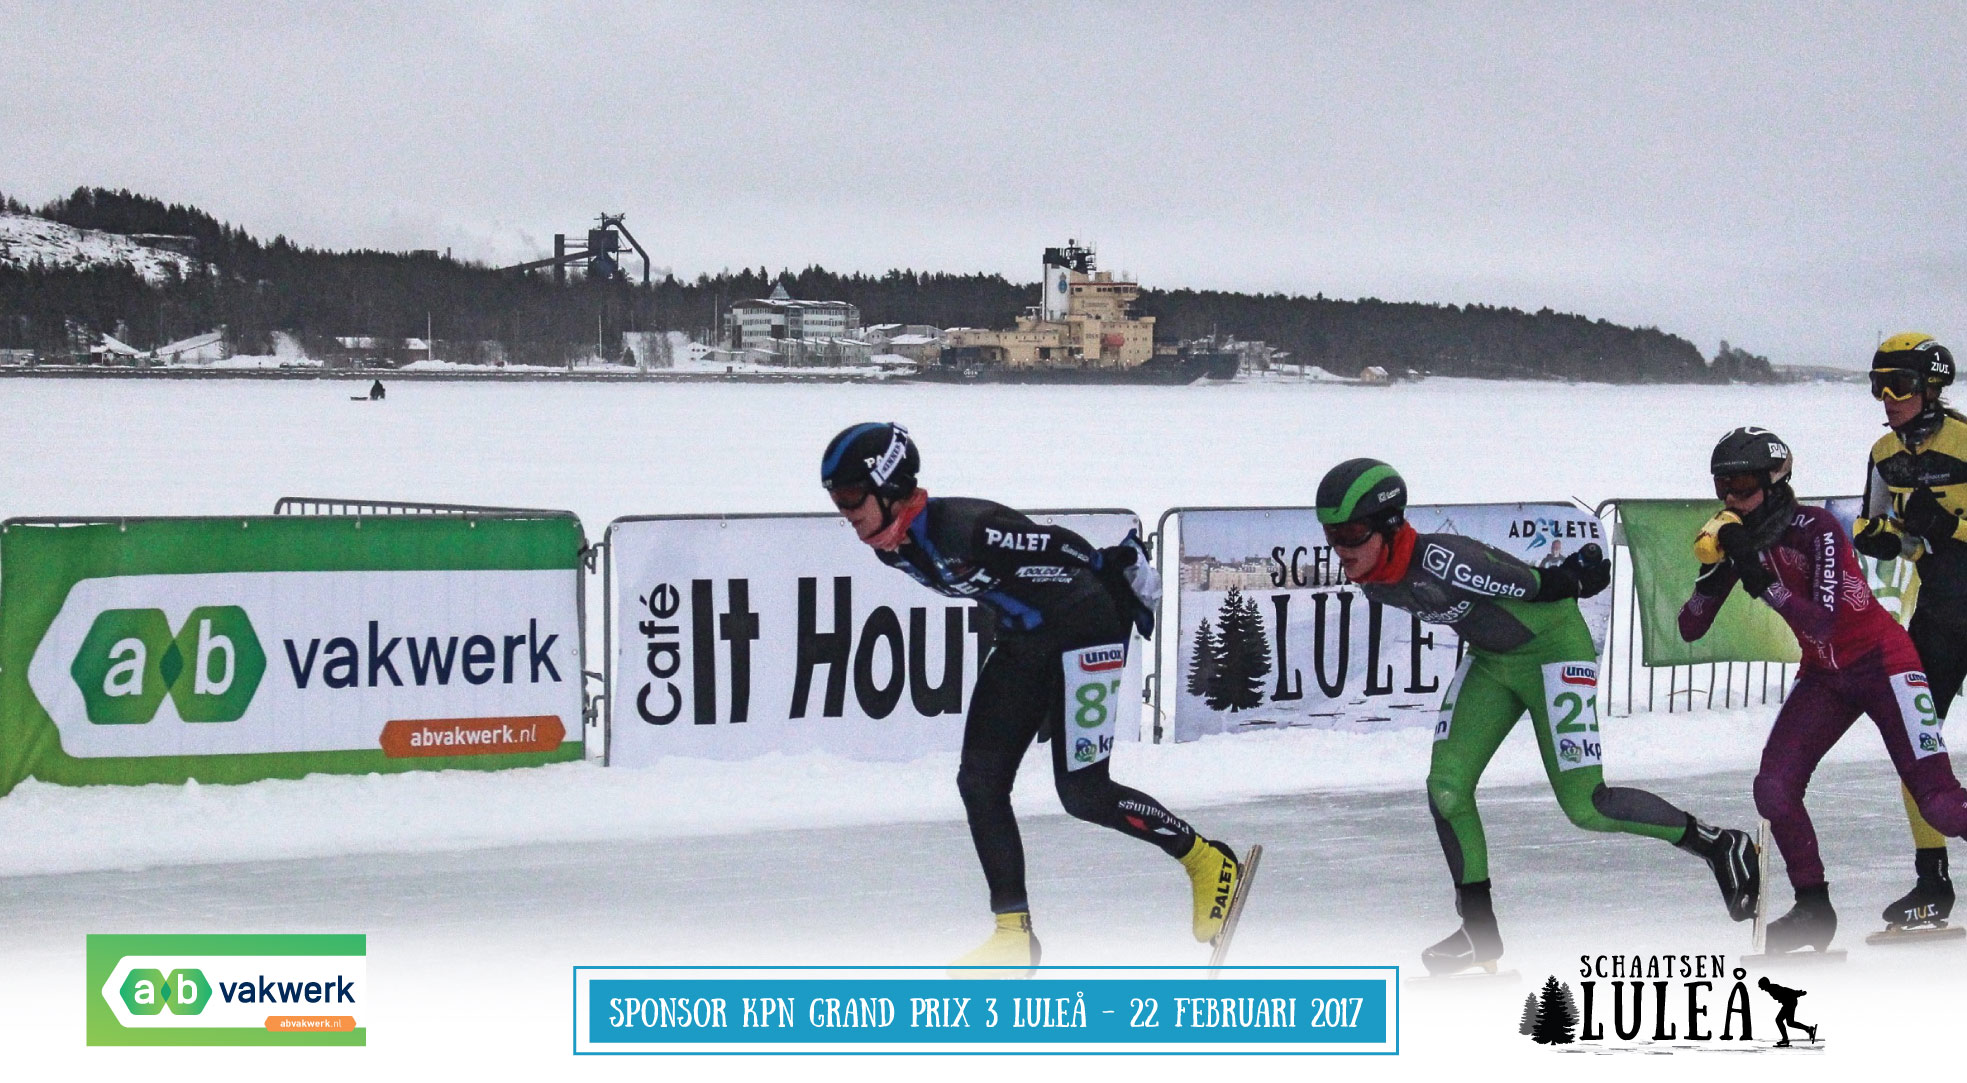 ab-vakwerk-sponsor-boarding-lulea-2017-ijsbreker